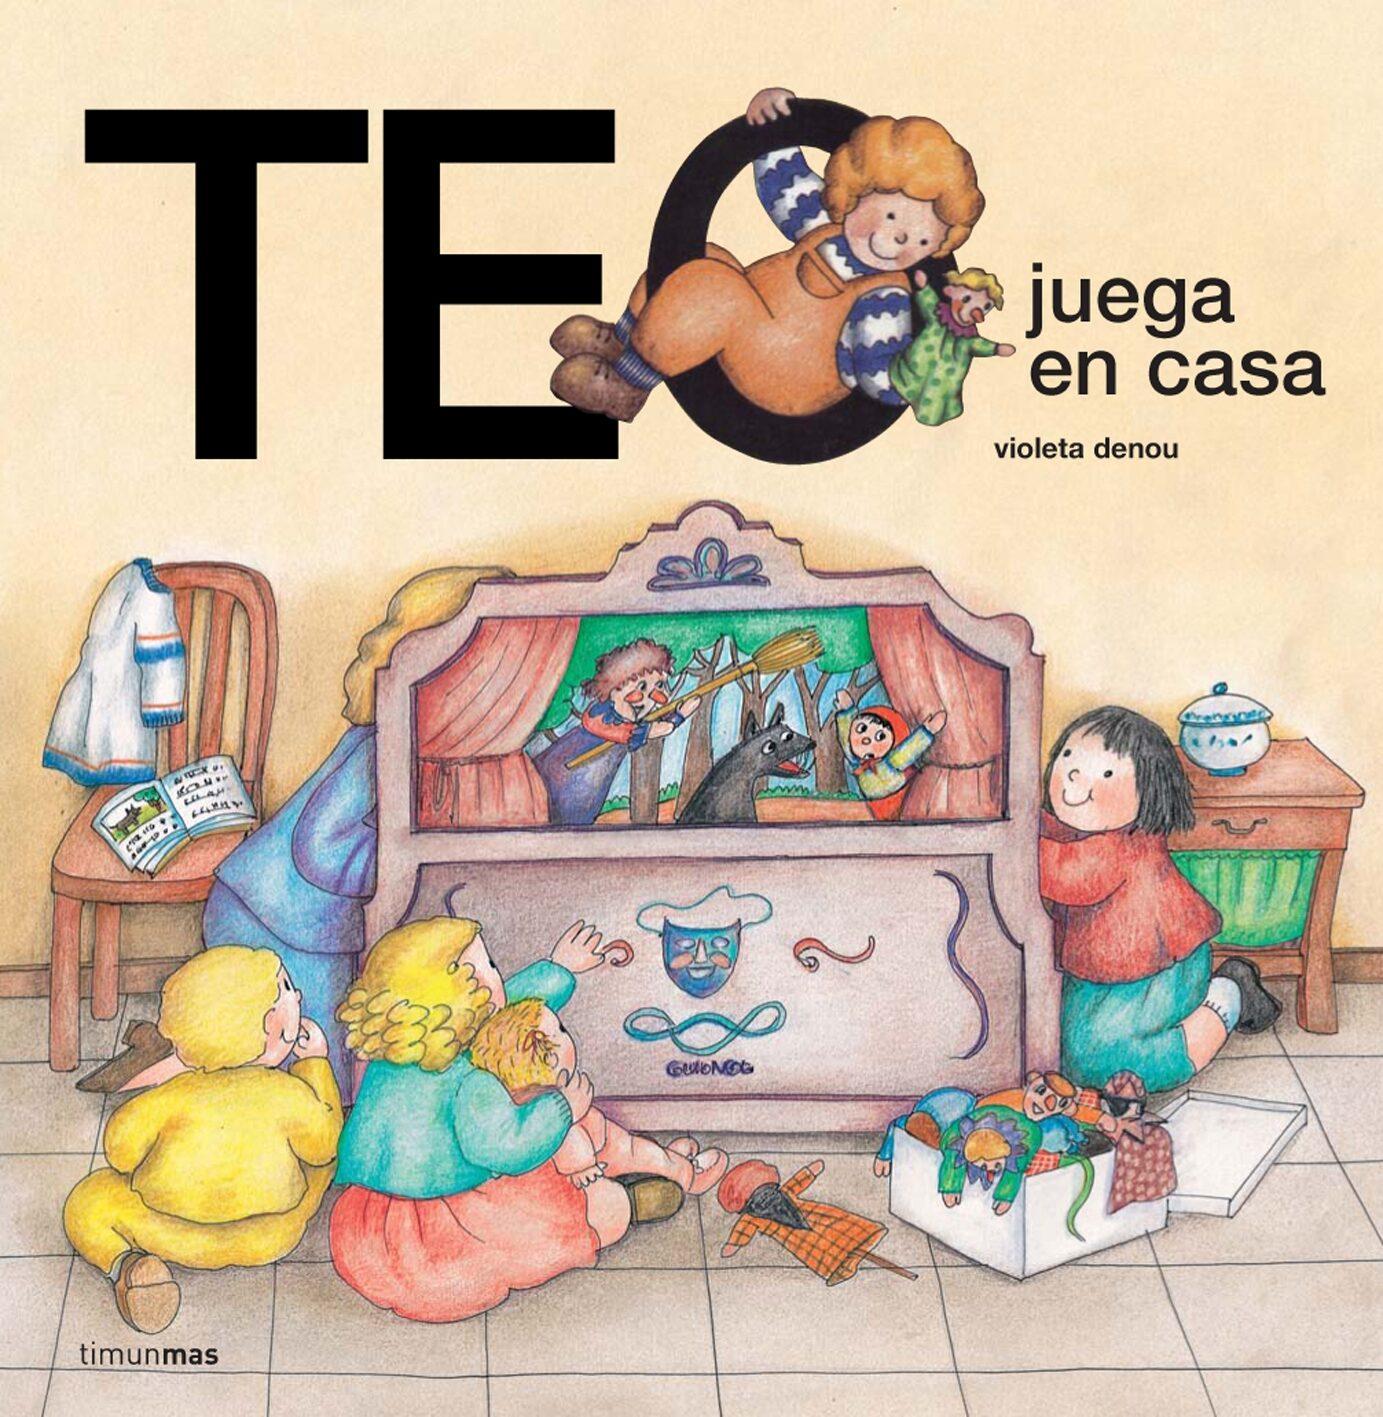 Teo Juega En Casa por Violeta Denou